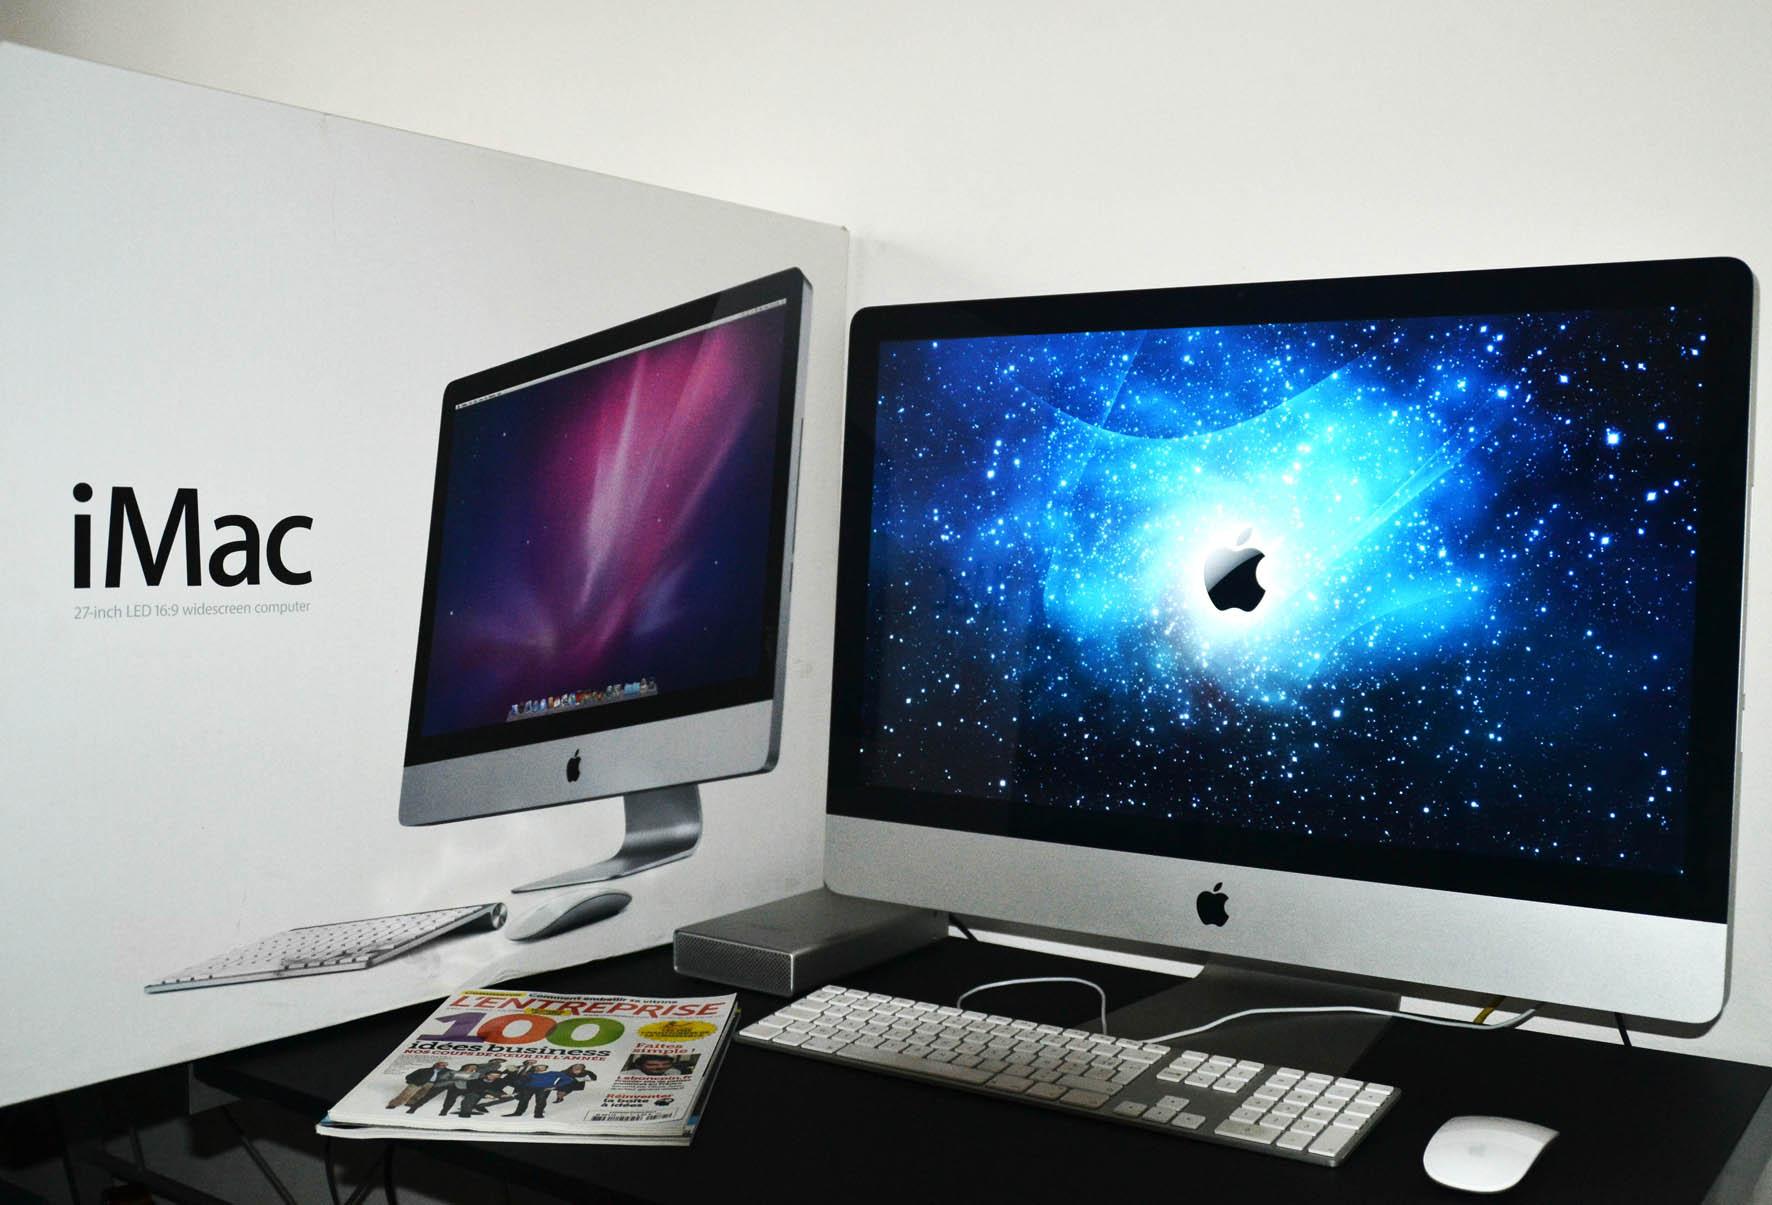 apple imac 27 mf886 18800 jimmy sebastain 6701. Black Bedroom Furniture Sets. Home Design Ideas